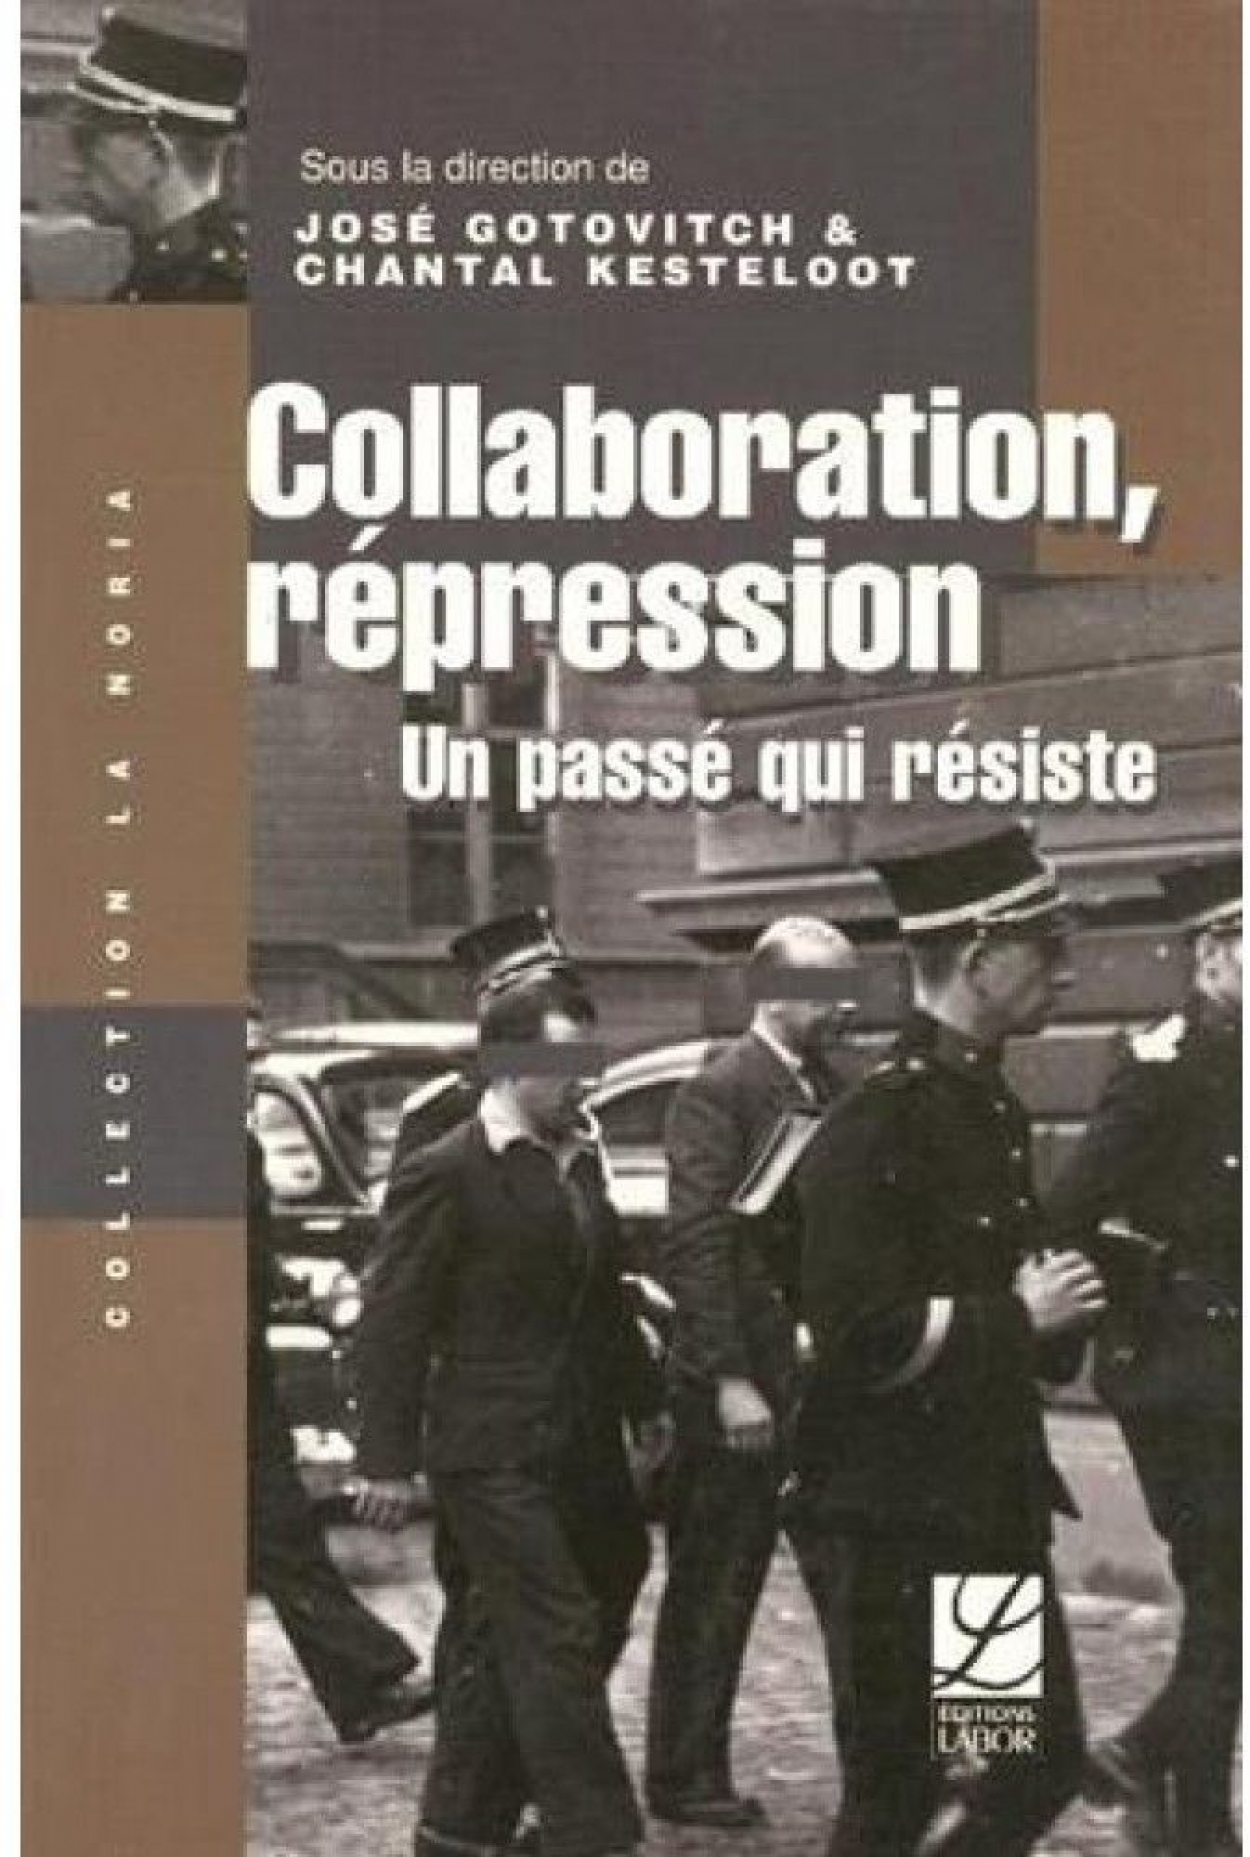 occupation-repression-un-passe-qui-resiste-9782804016630_0.jpg